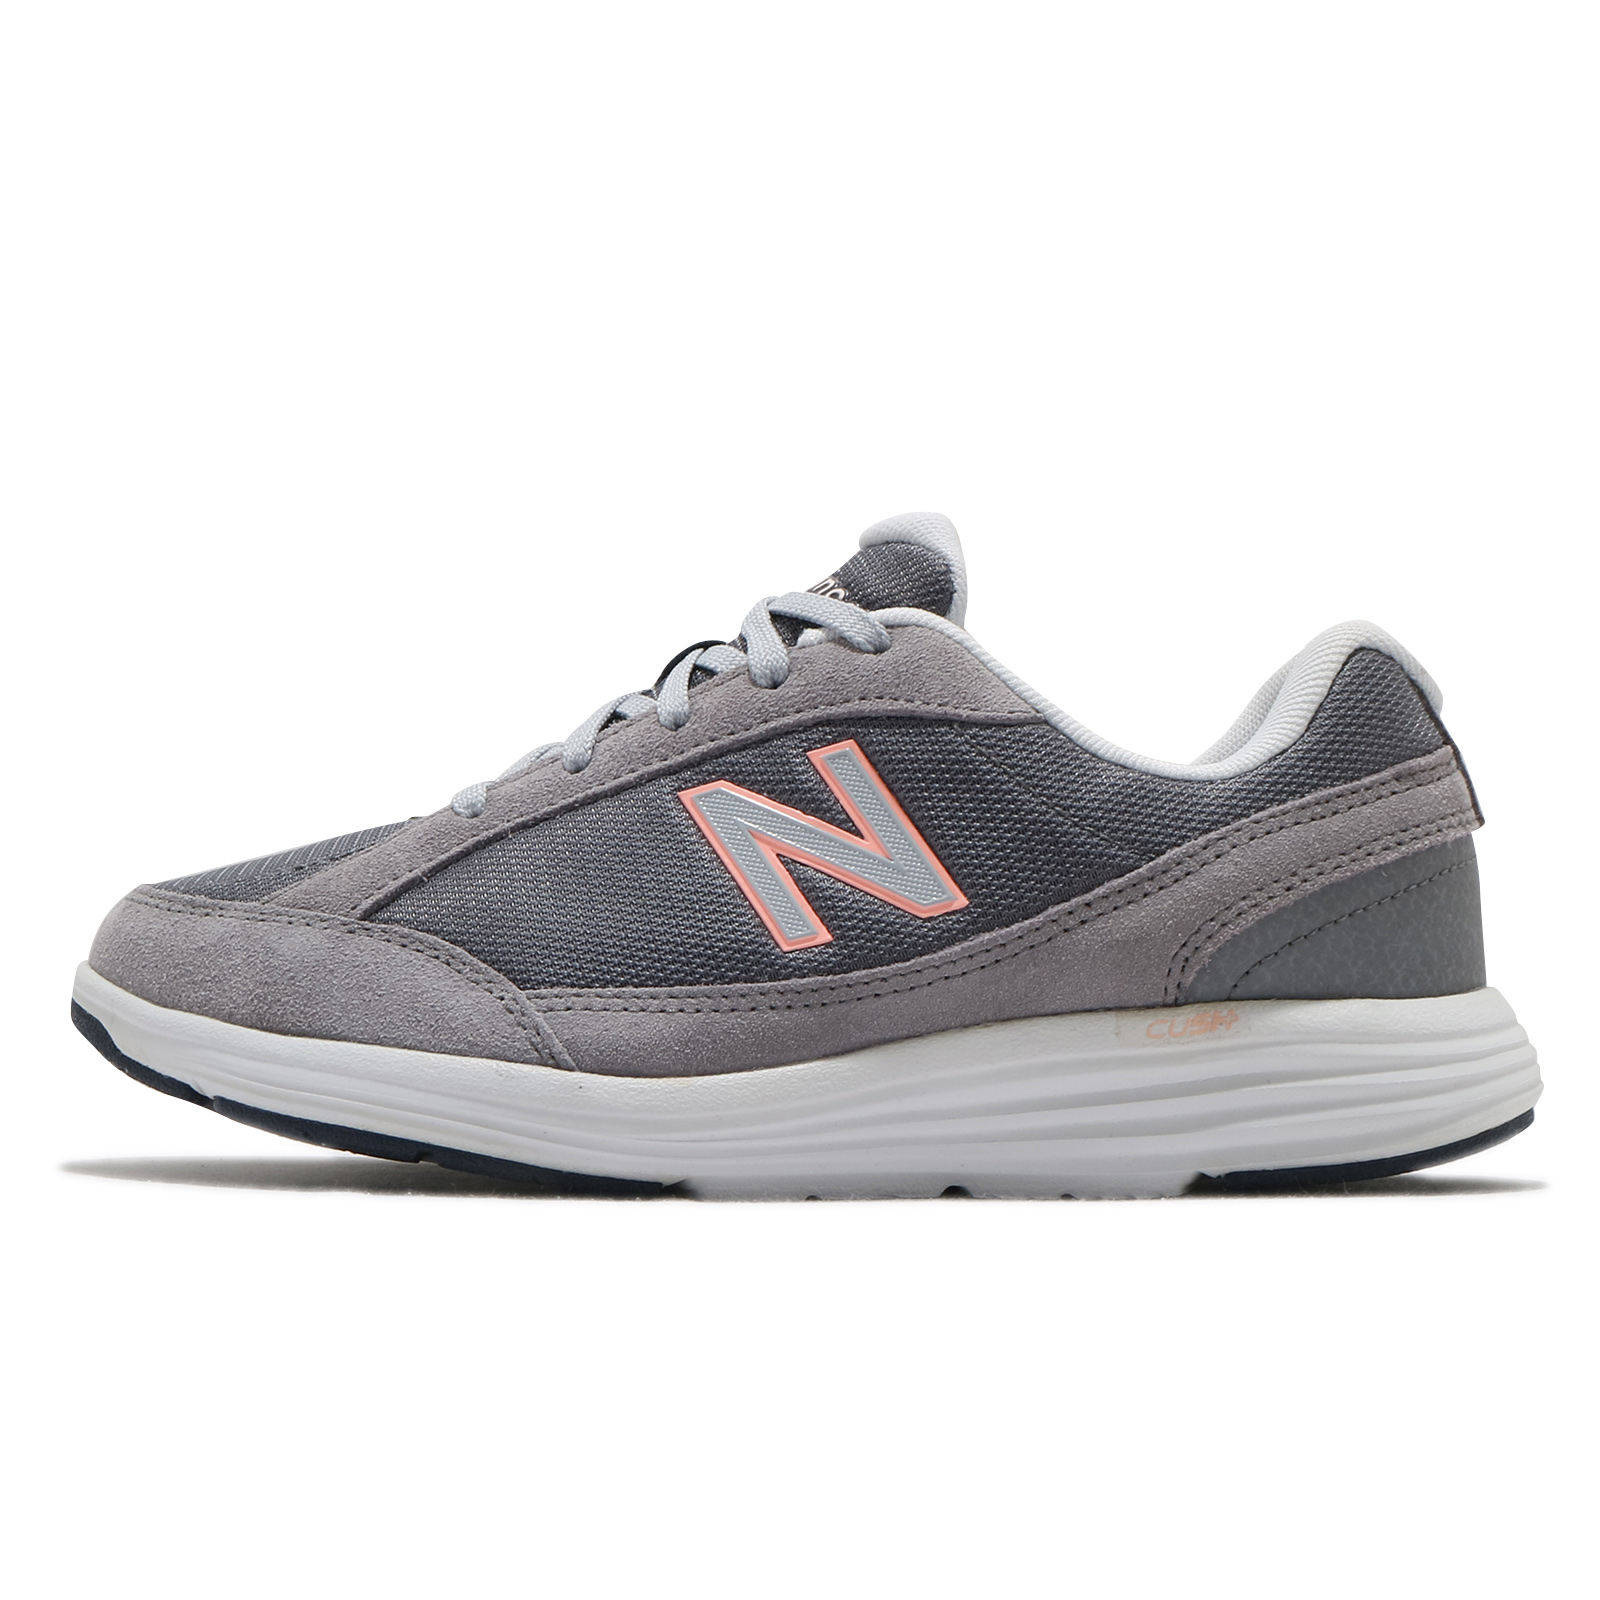 New Balance 685 寬楦 灰 粉紅 NB 走路鞋 休閒鞋 女鞋 基本款 【ACS】 WW685SG3 2E